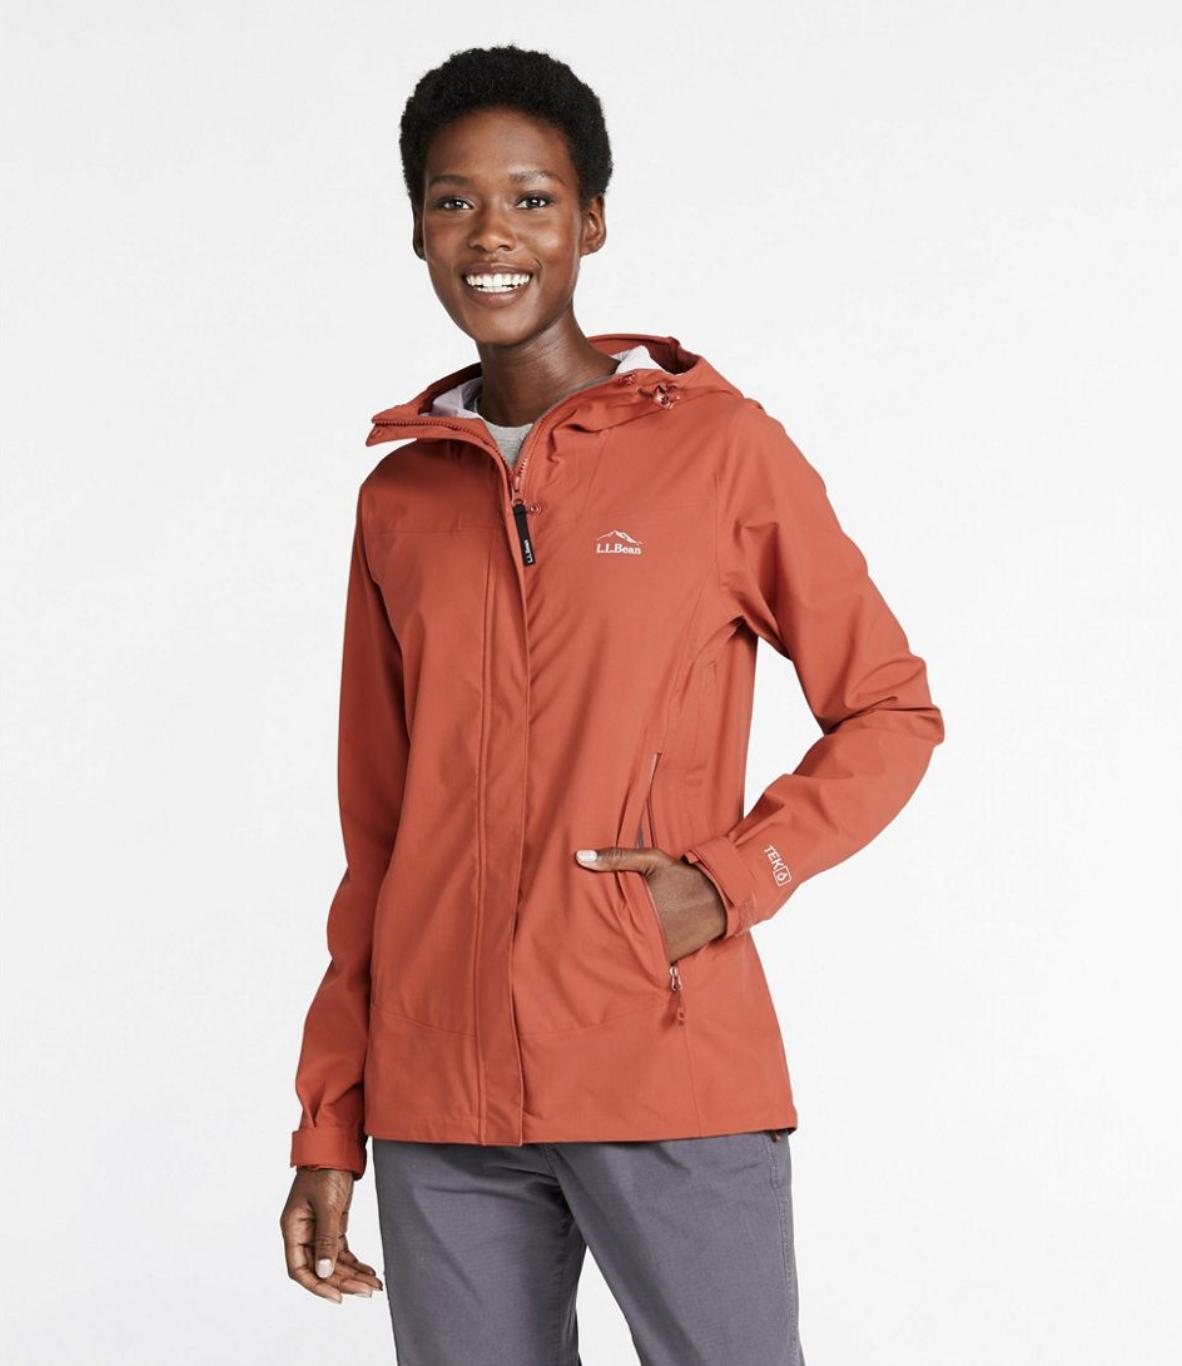 L.L.Bean: Women's Cresta Stretch Rain Jacket for .99